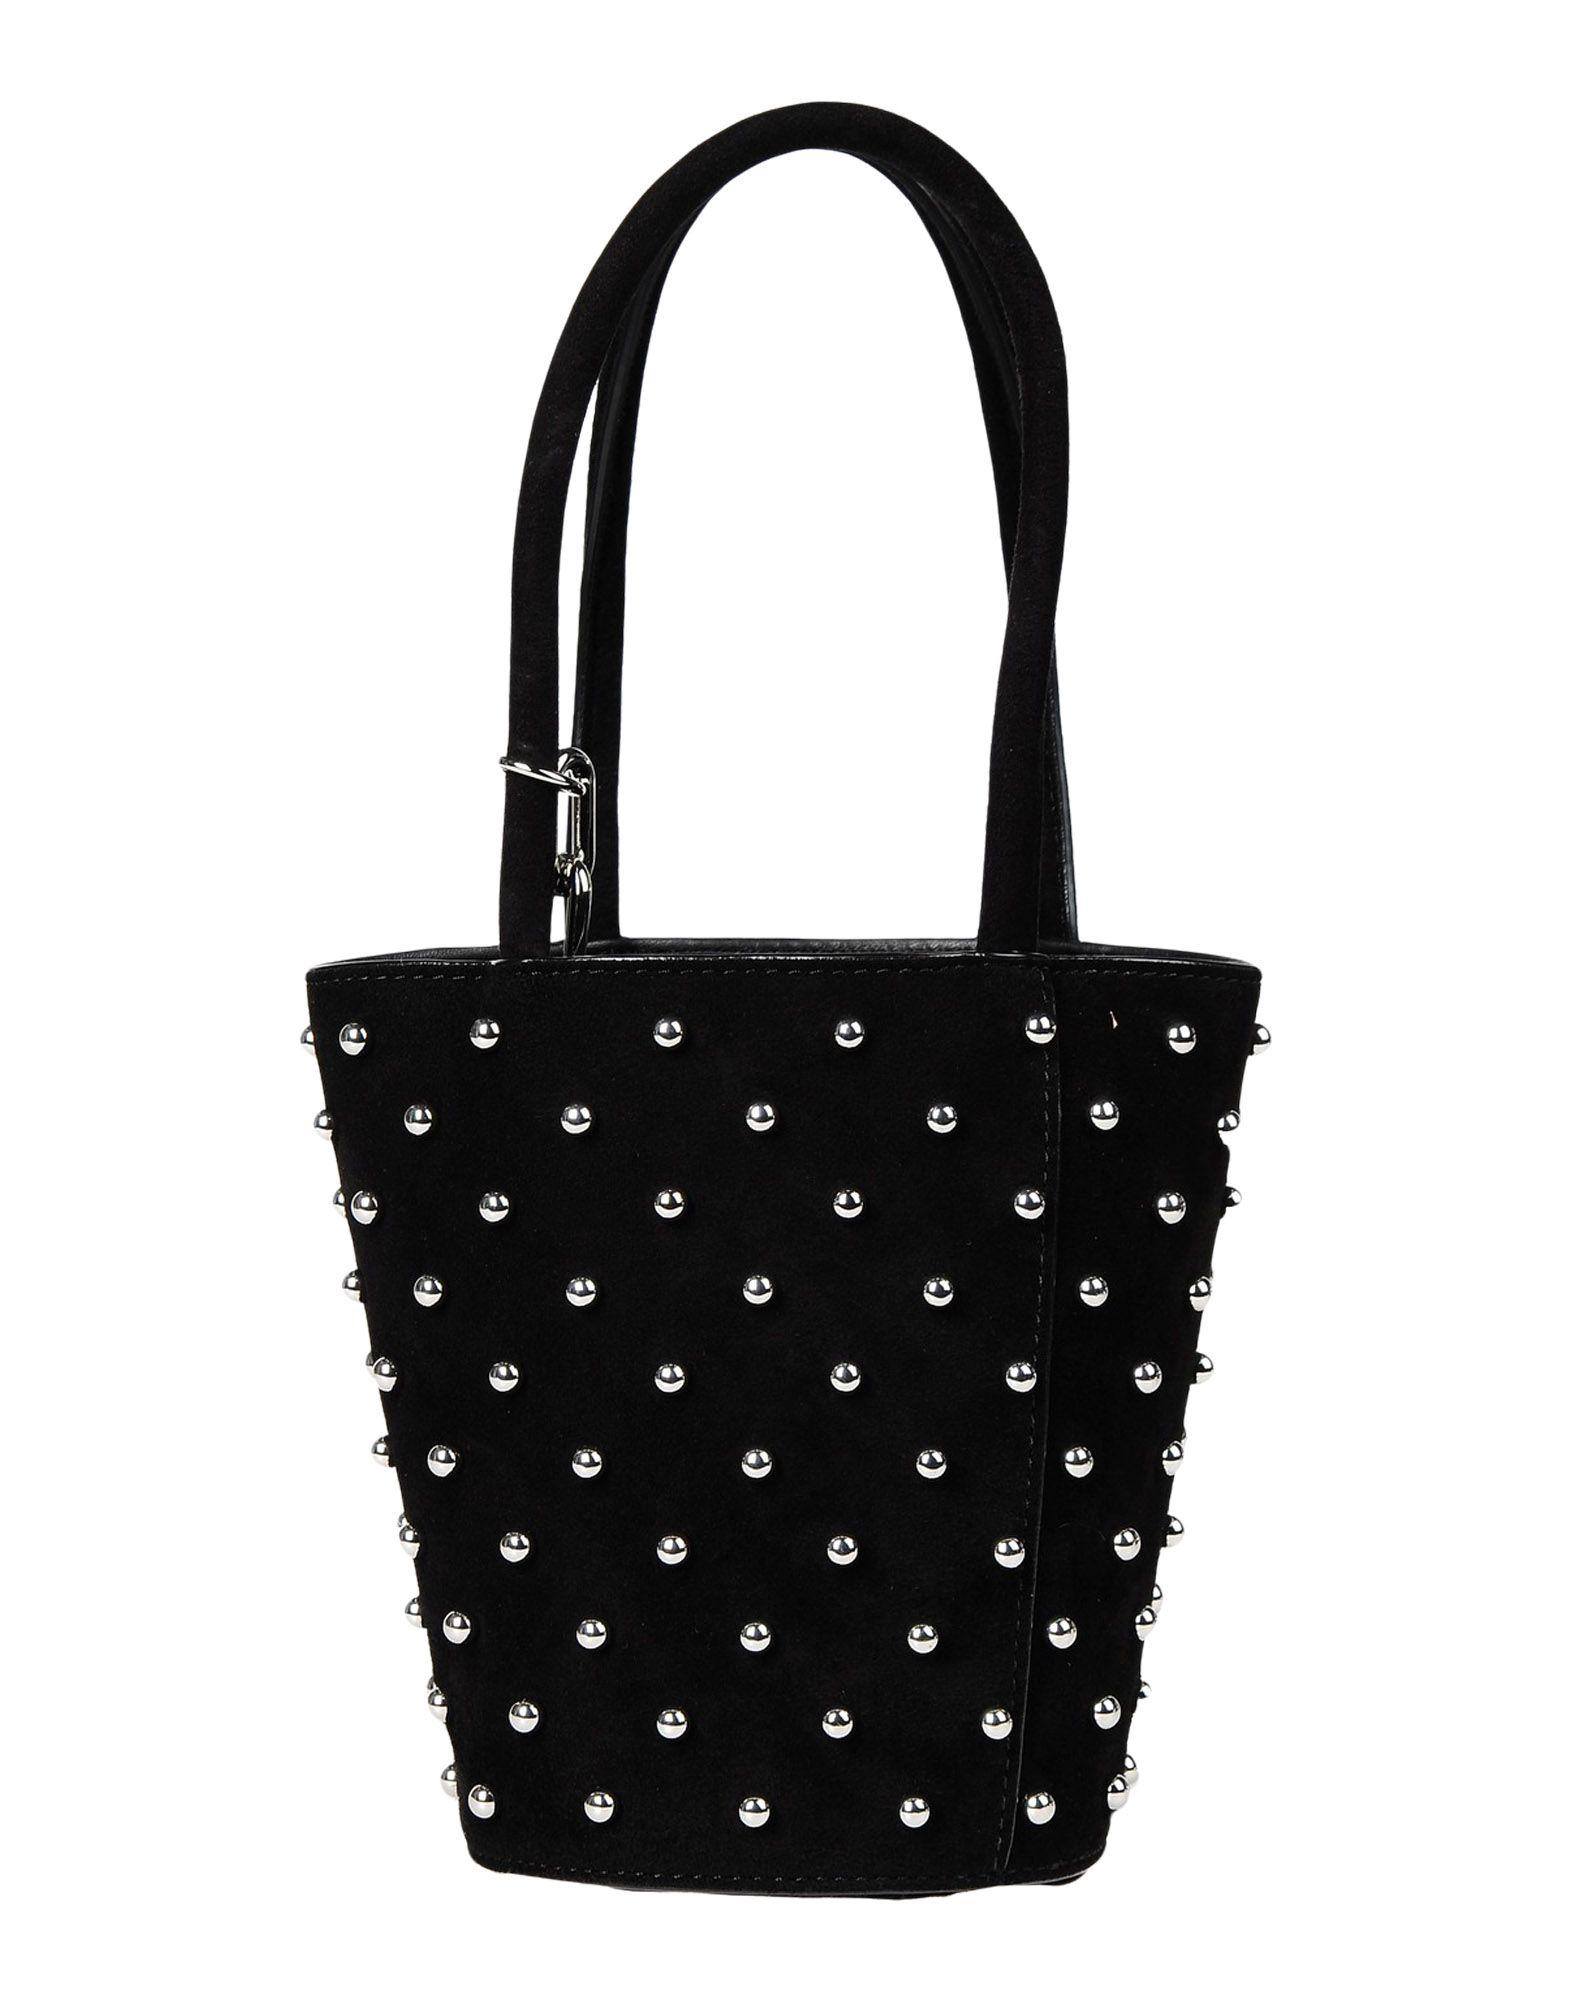 Alexander Wang Handbags In Black